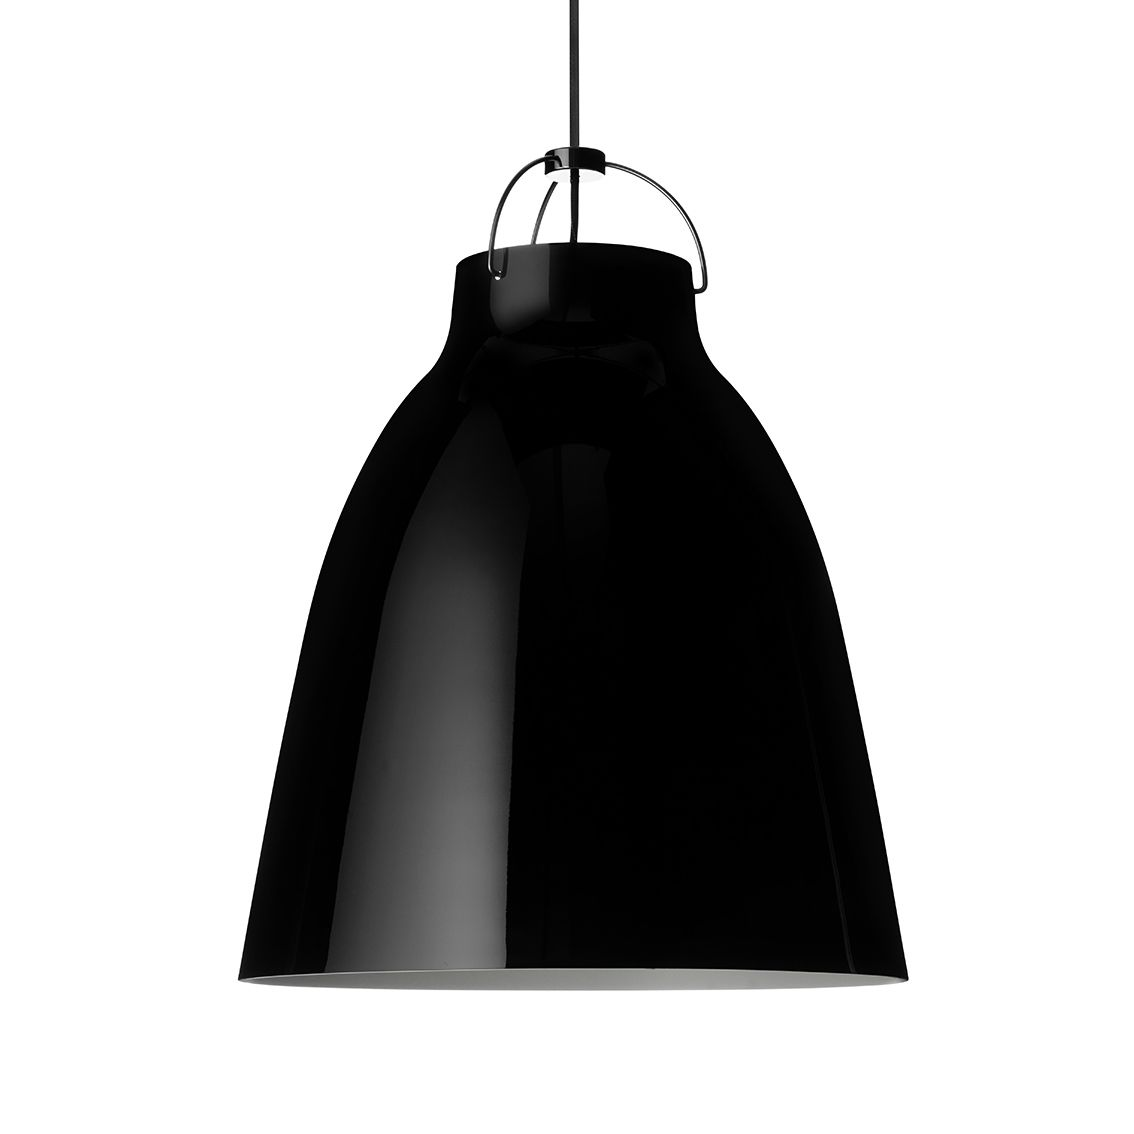 Caravaggio hanglamp Lightyears Ø40 hoogglans zwart